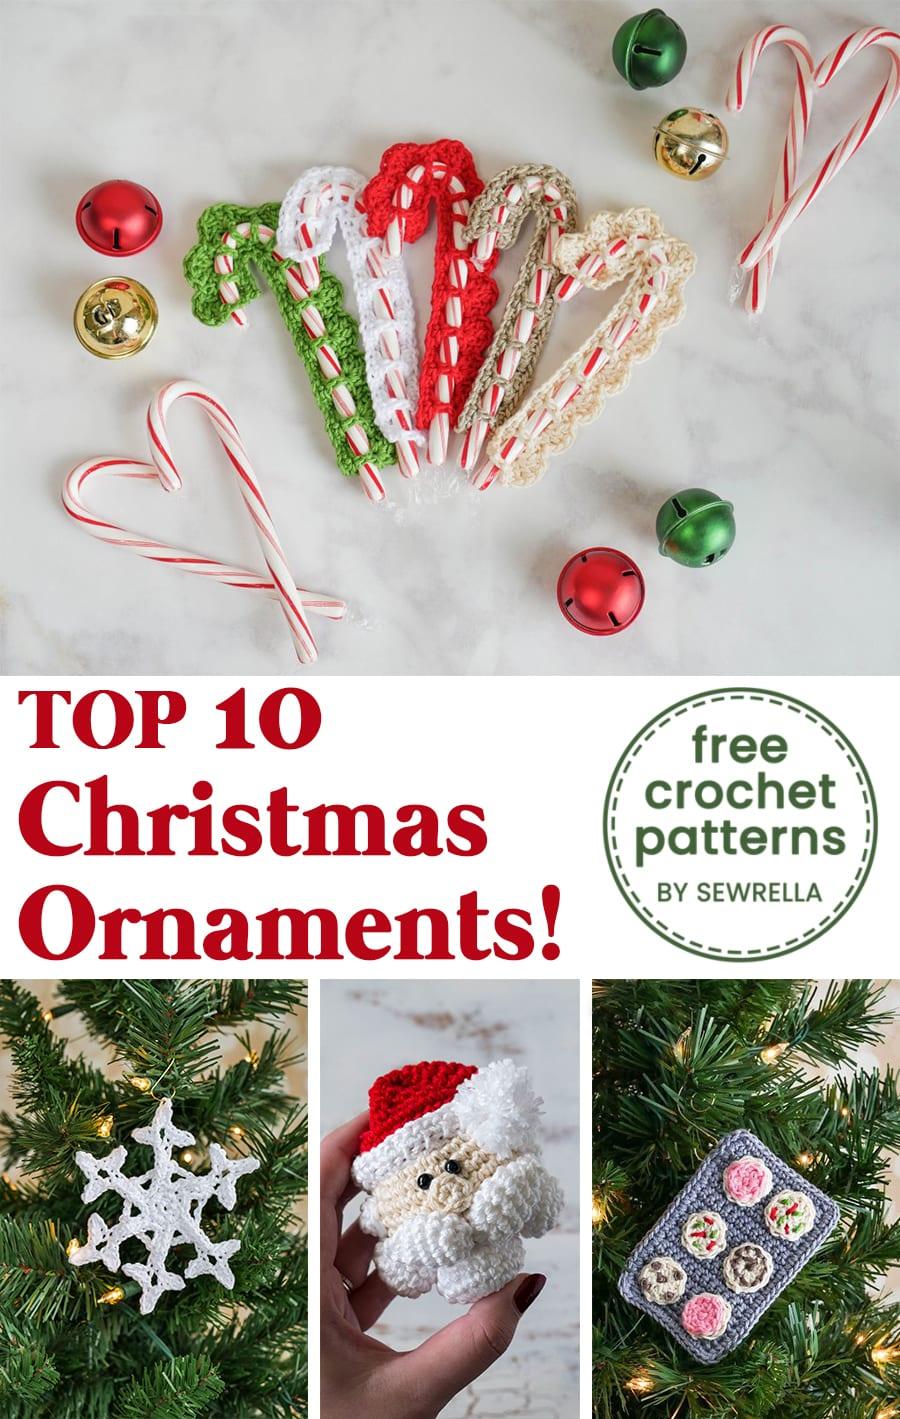 My Top 10 Crochet Holiday Ornaments - Sewrella